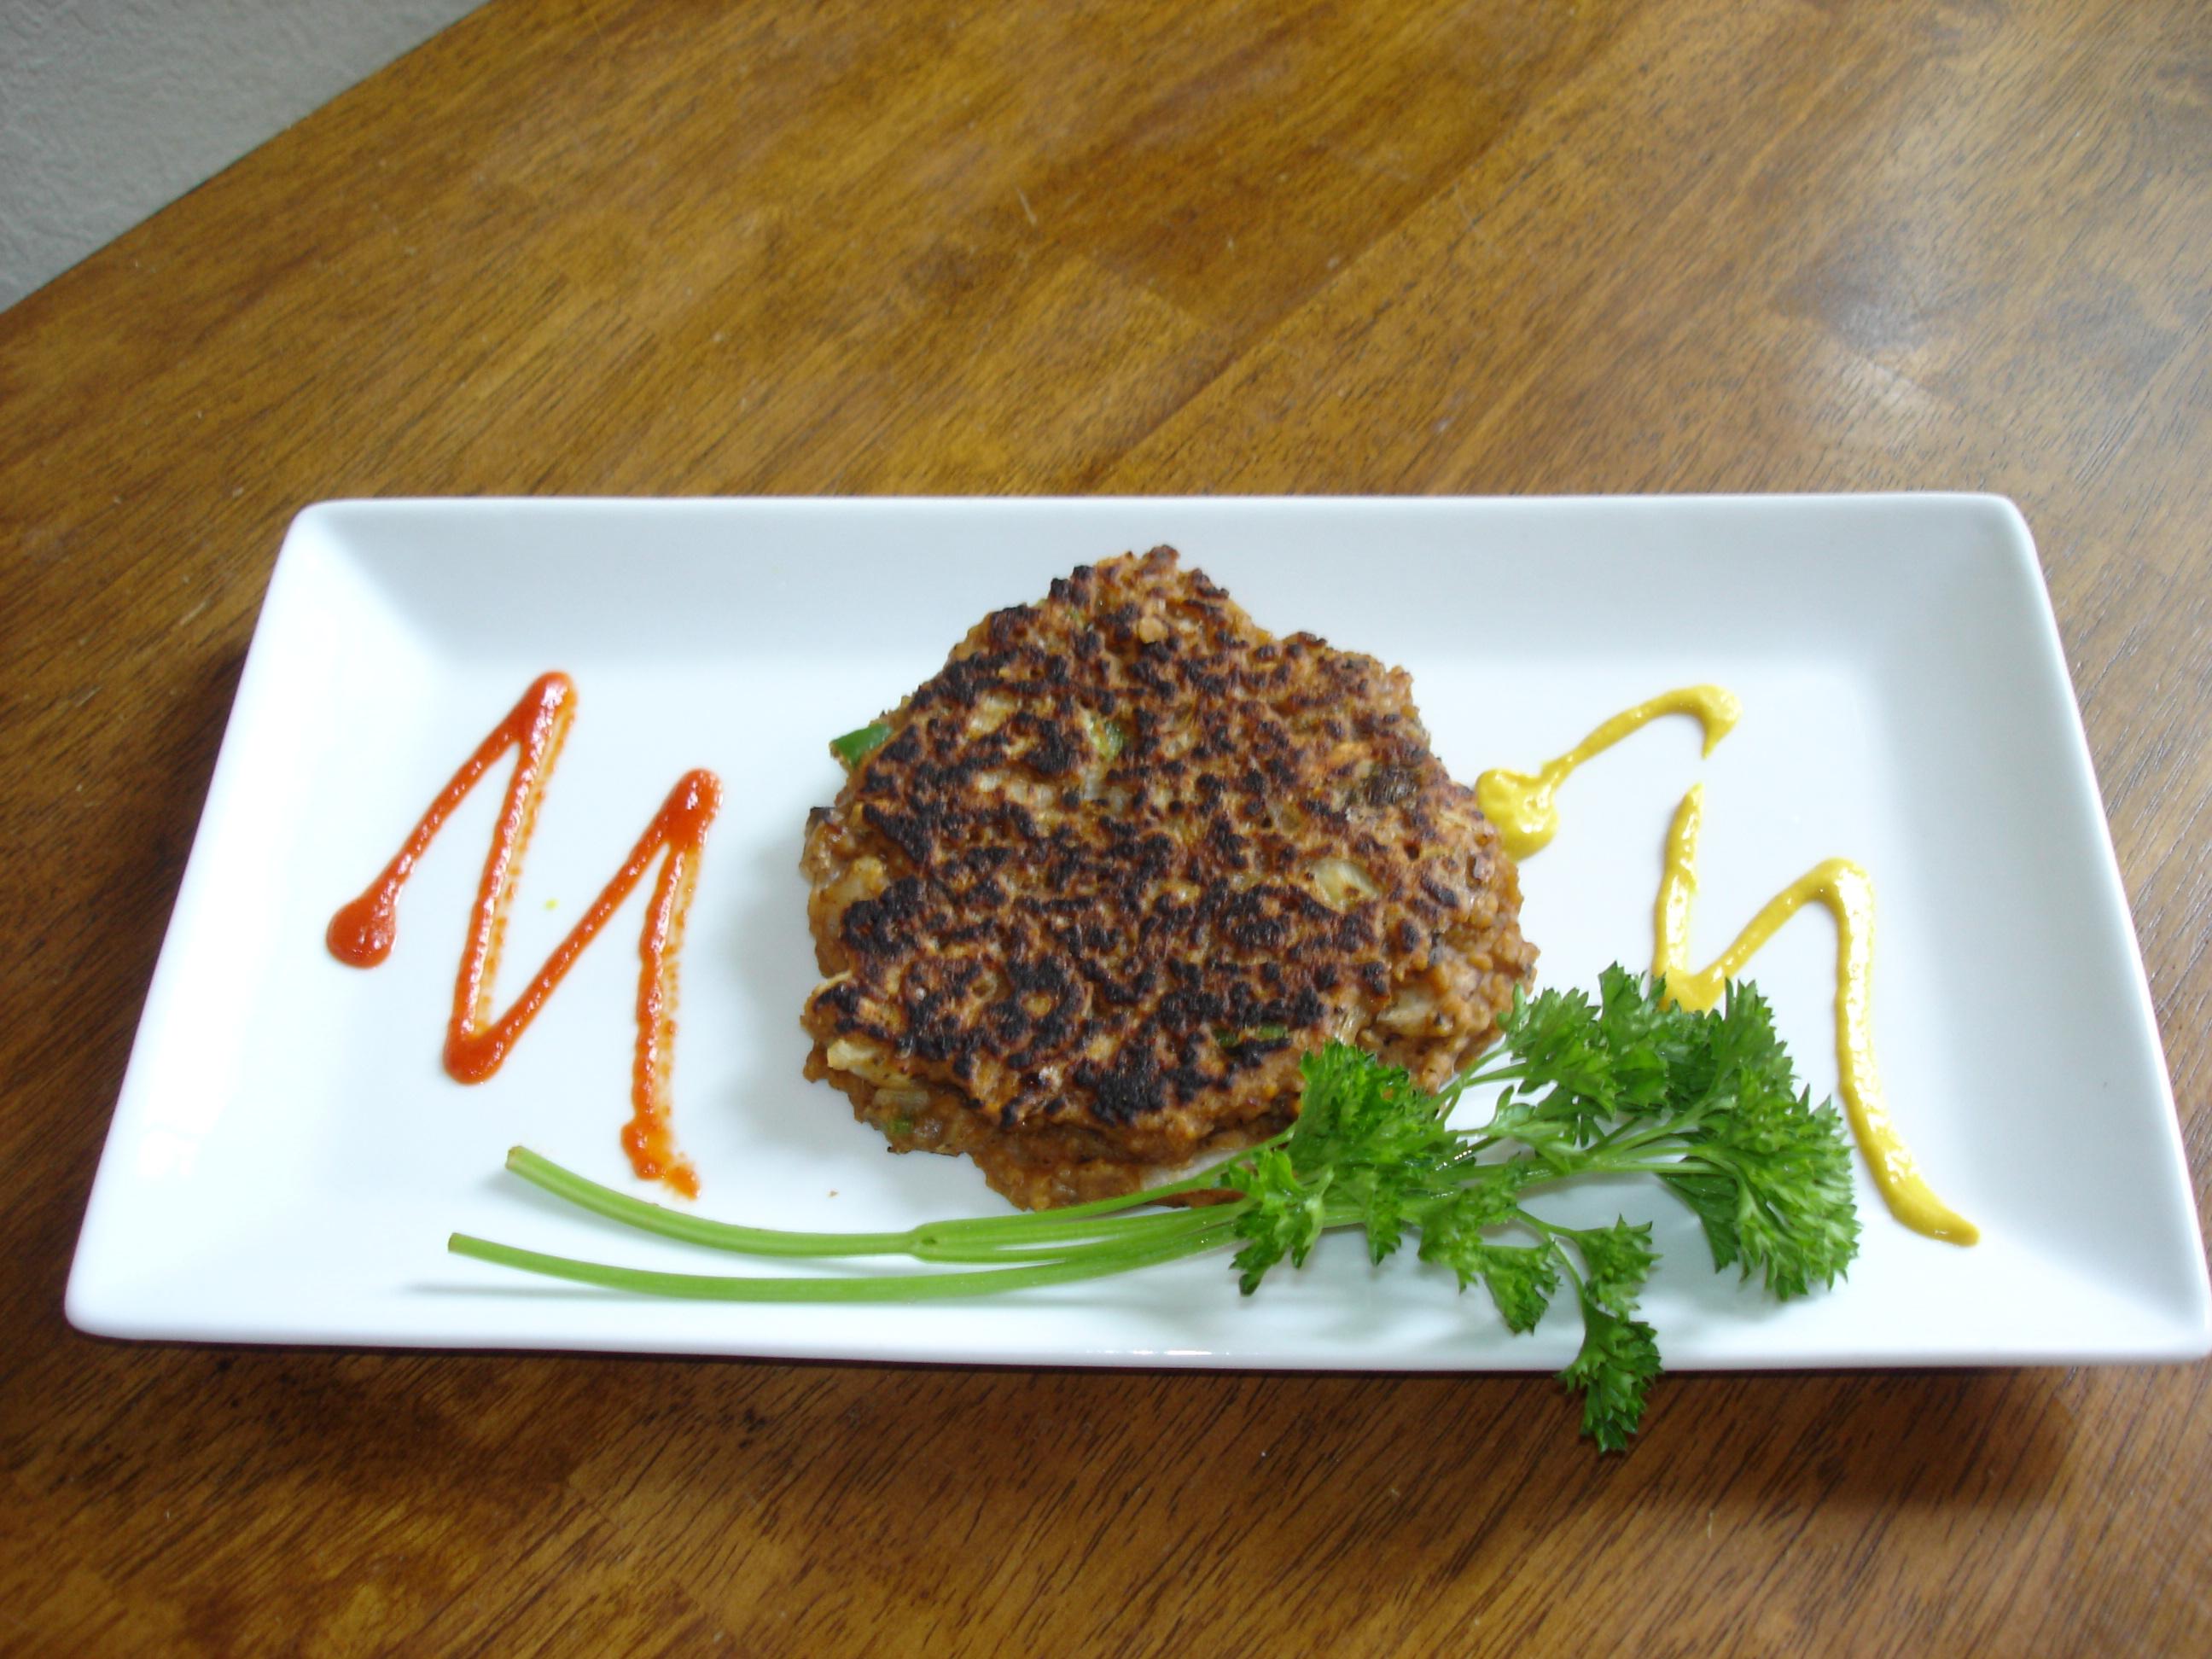 Not-so-veggie Veggie Burger